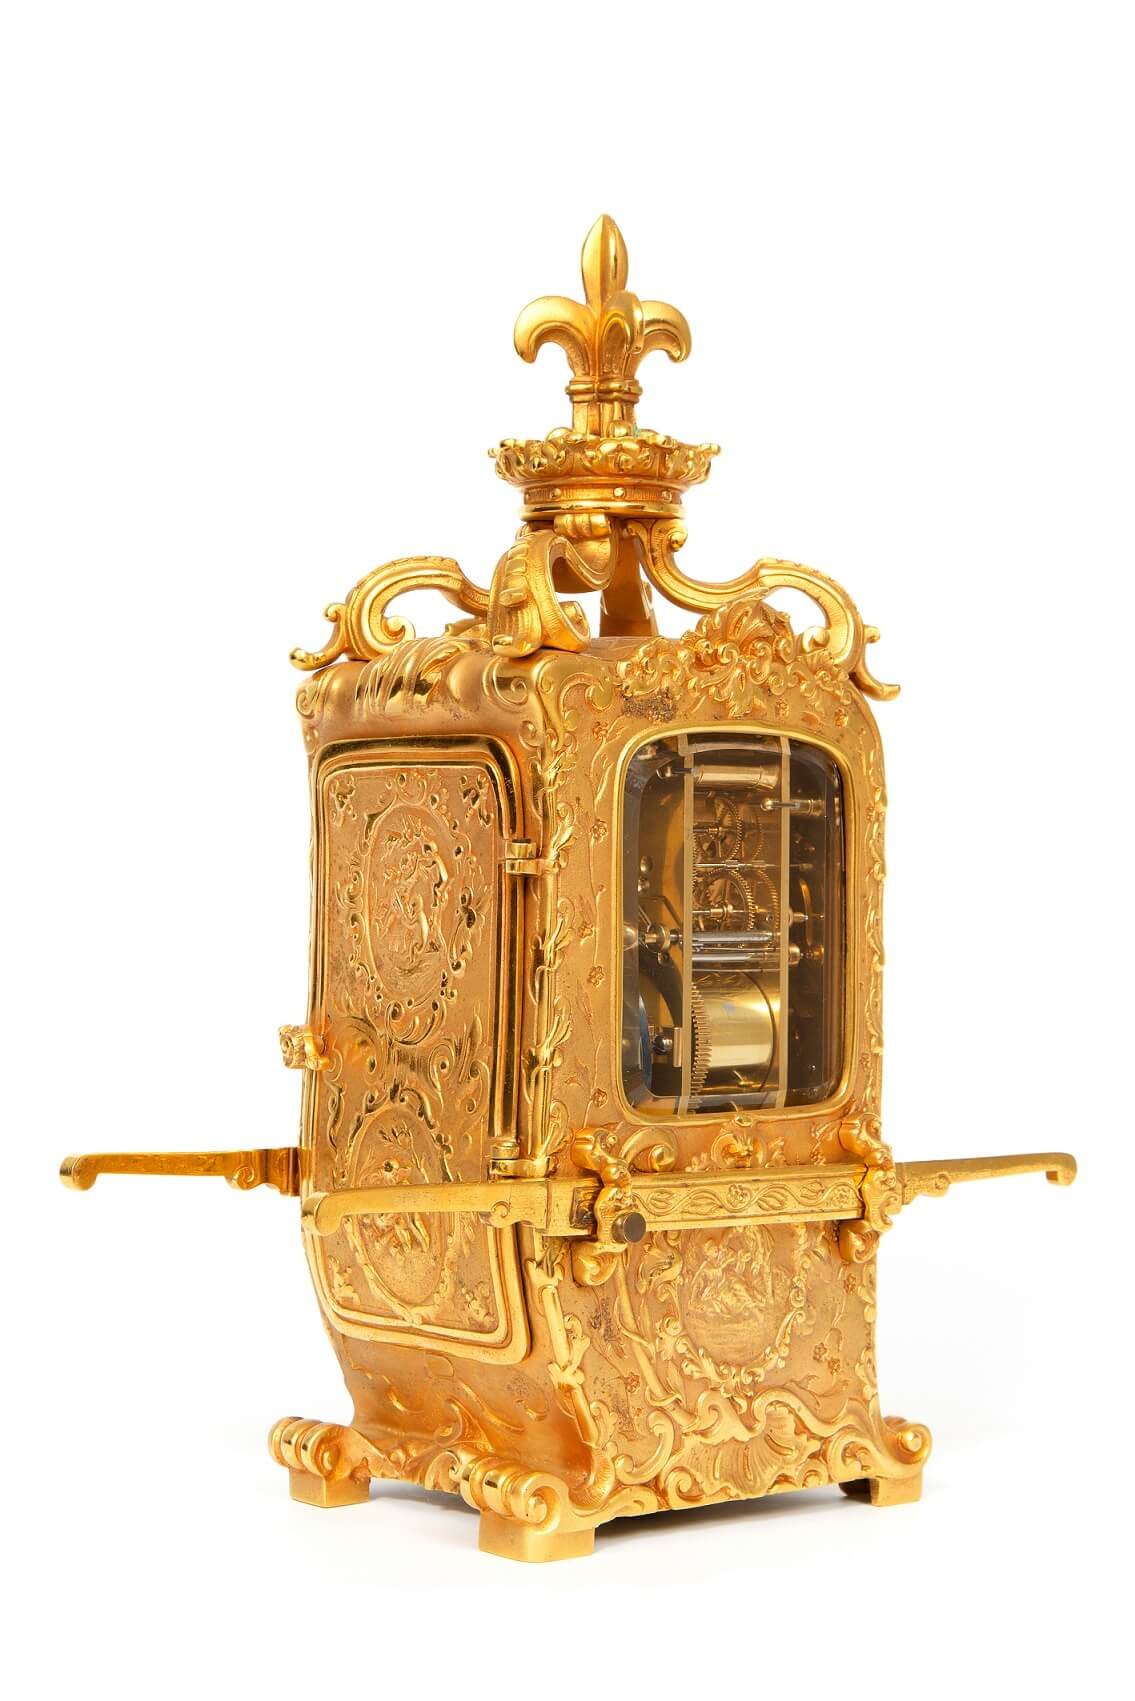 French Sedan Carriage Clock 4-152